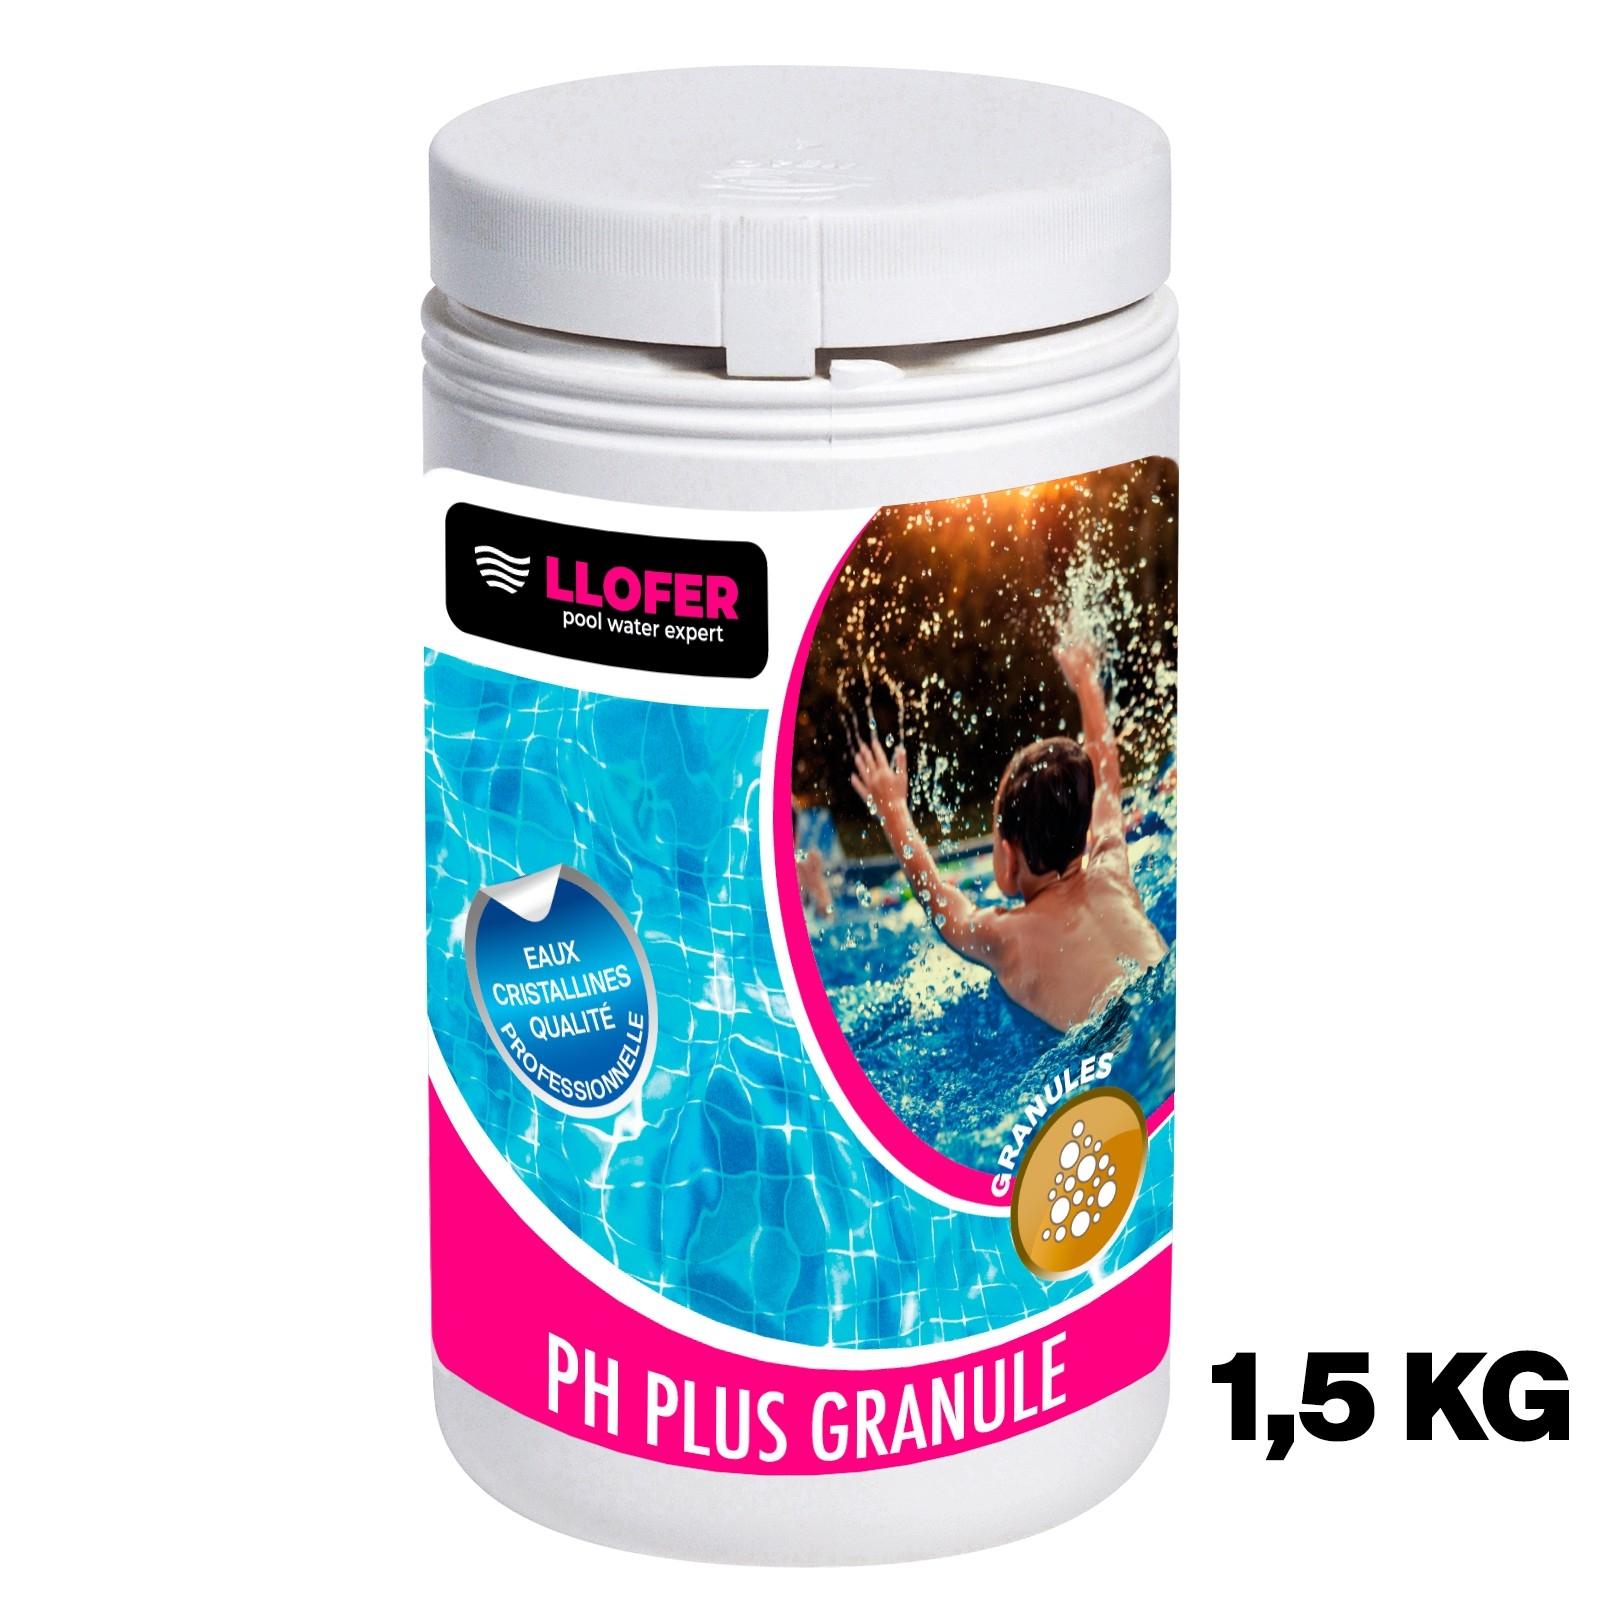 1,5KG PH PLUS GRANULE